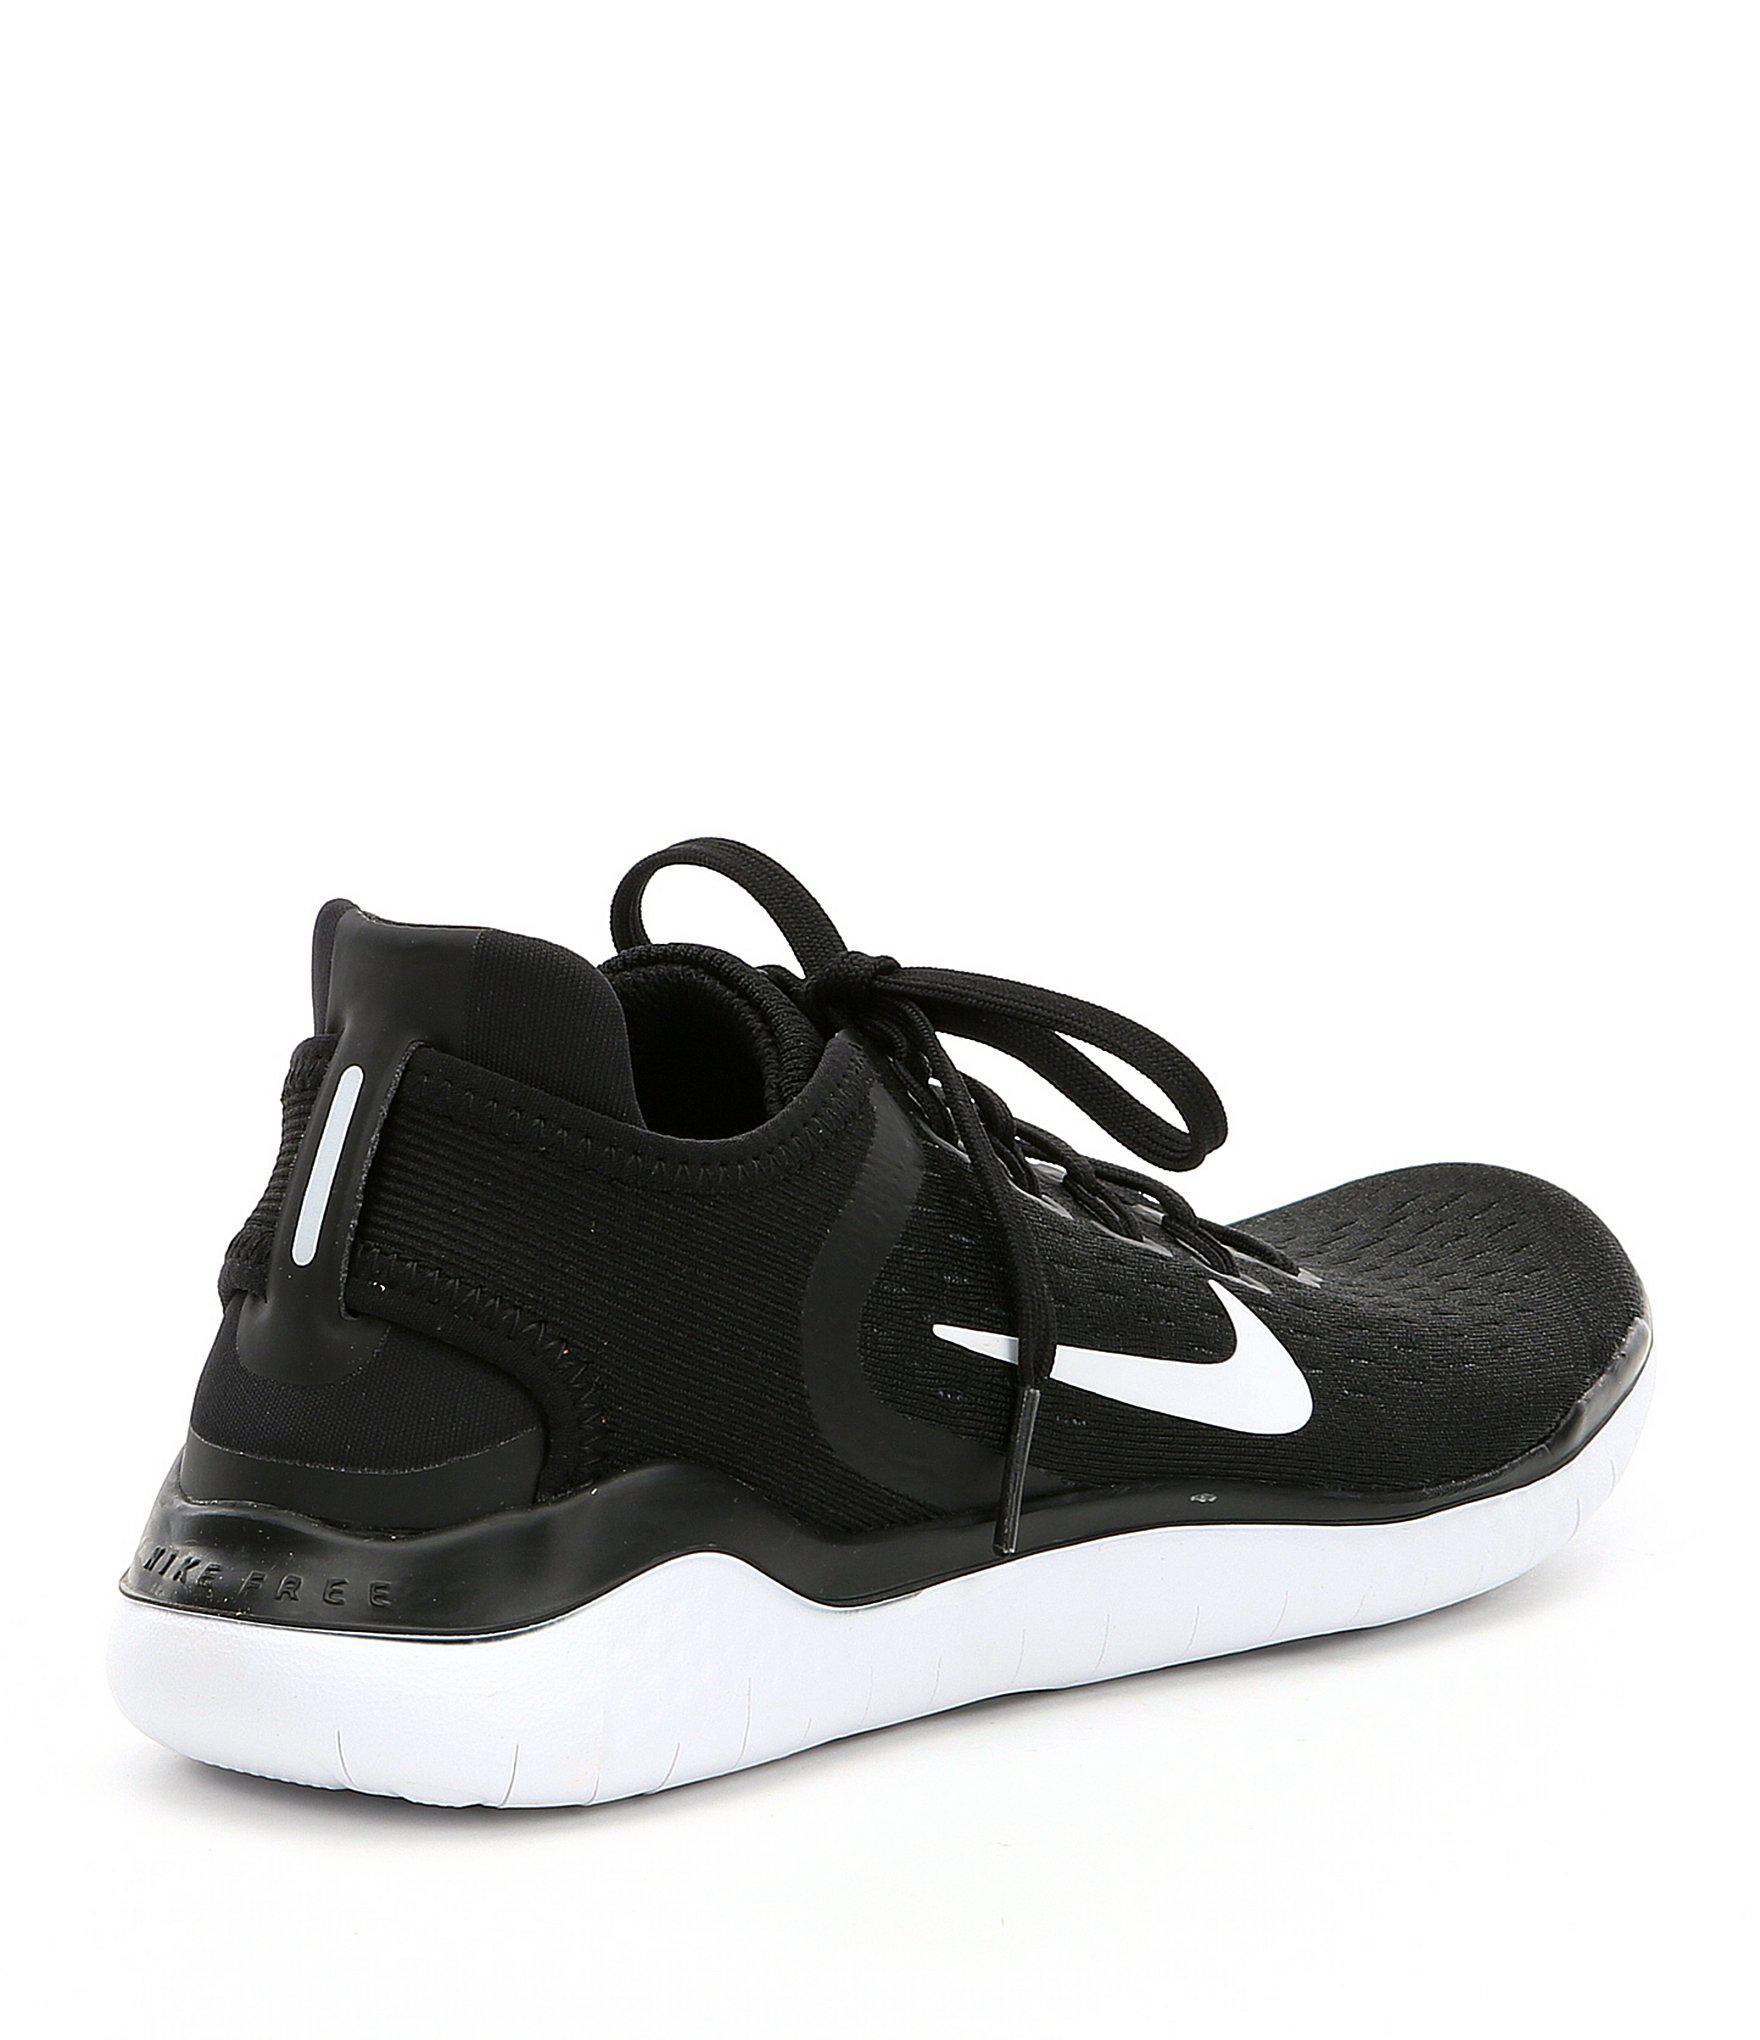 4da567452584 Lyst - Nike Women s Free Rn 2018 Running Shoes in Black